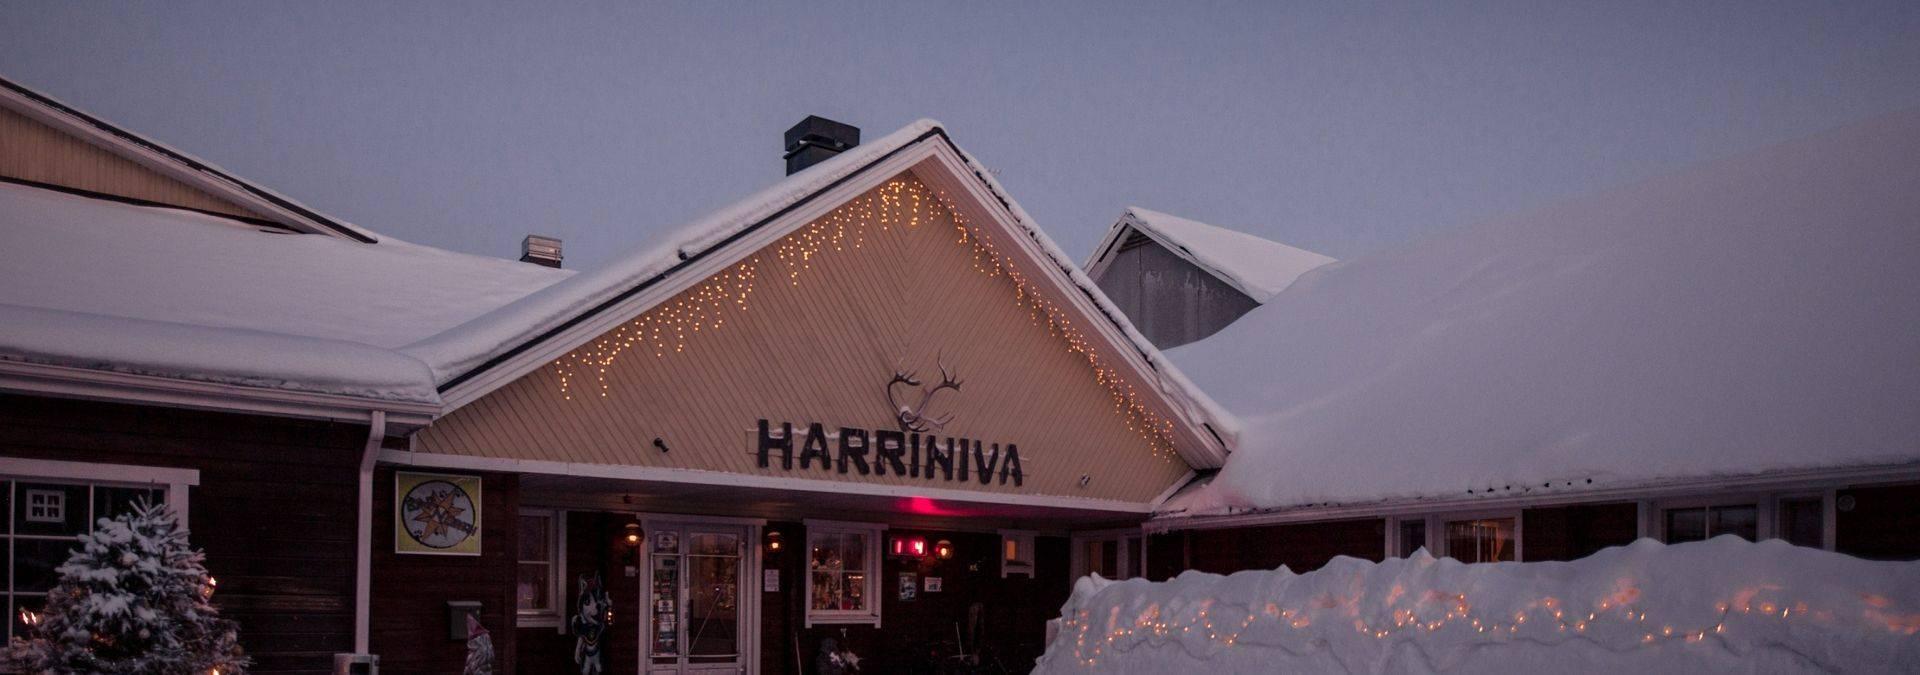 Harriniva Outside 12